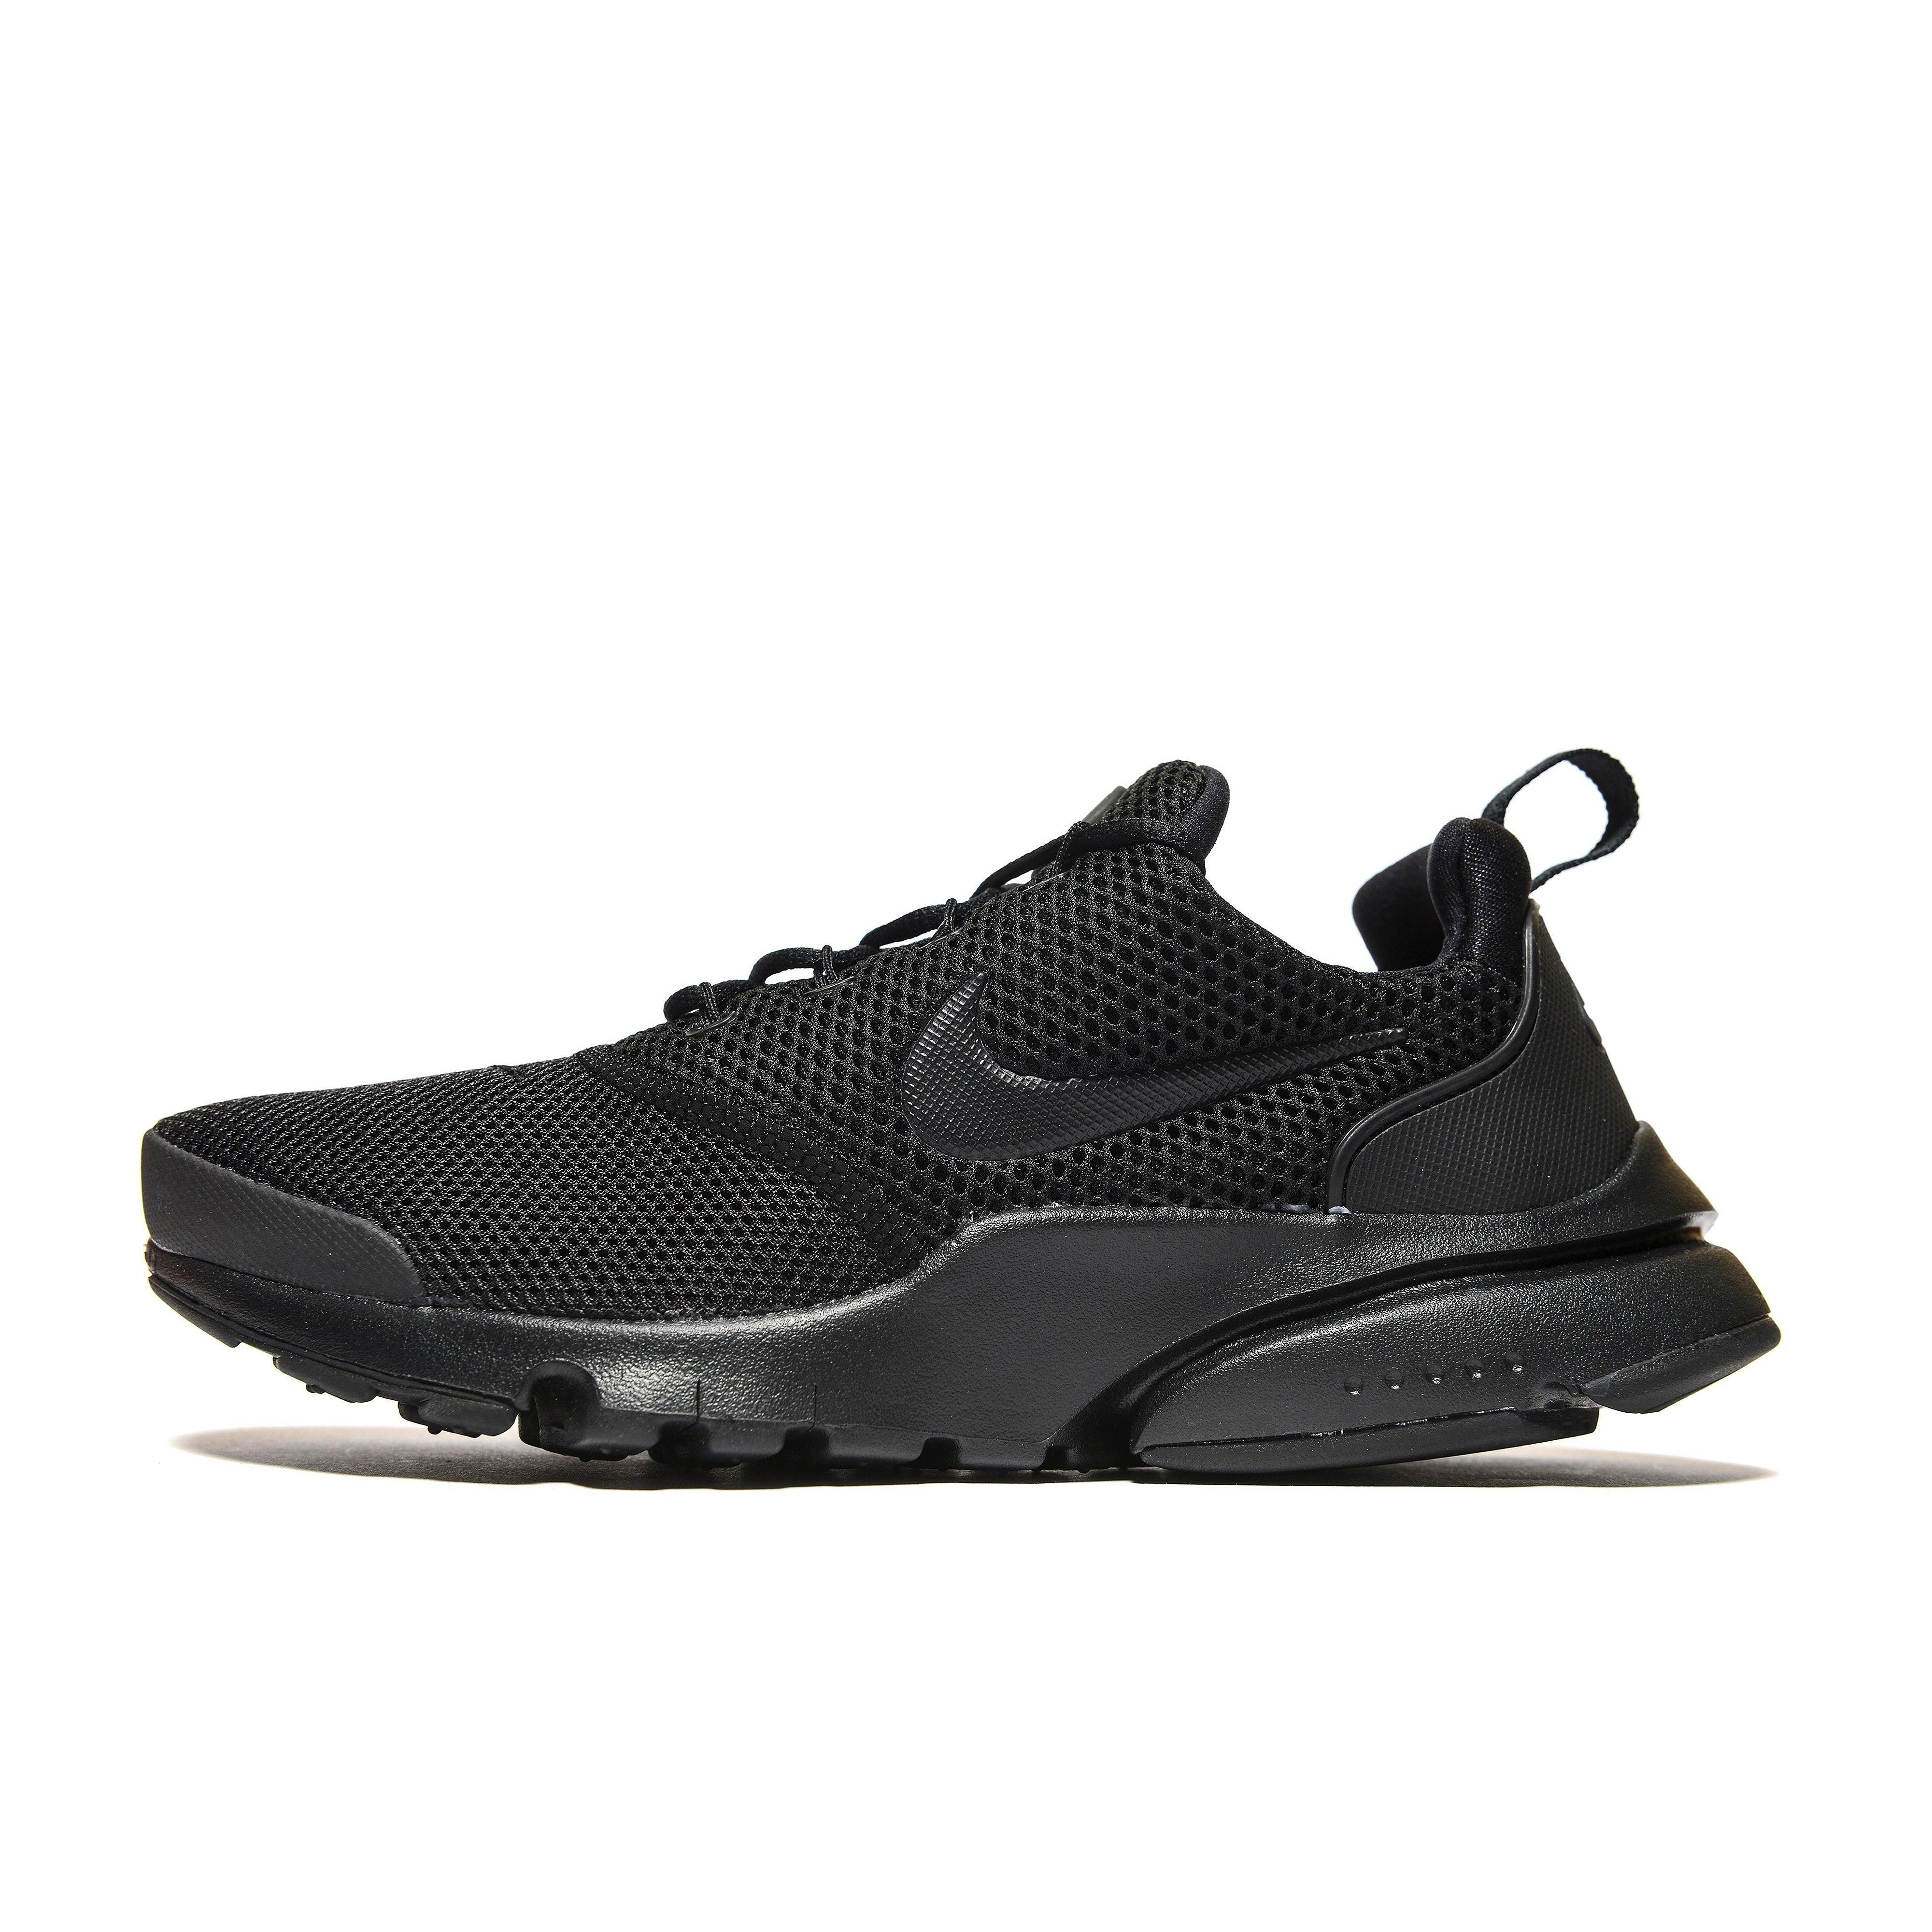 Nike Presto Fly Junior Training Shoes